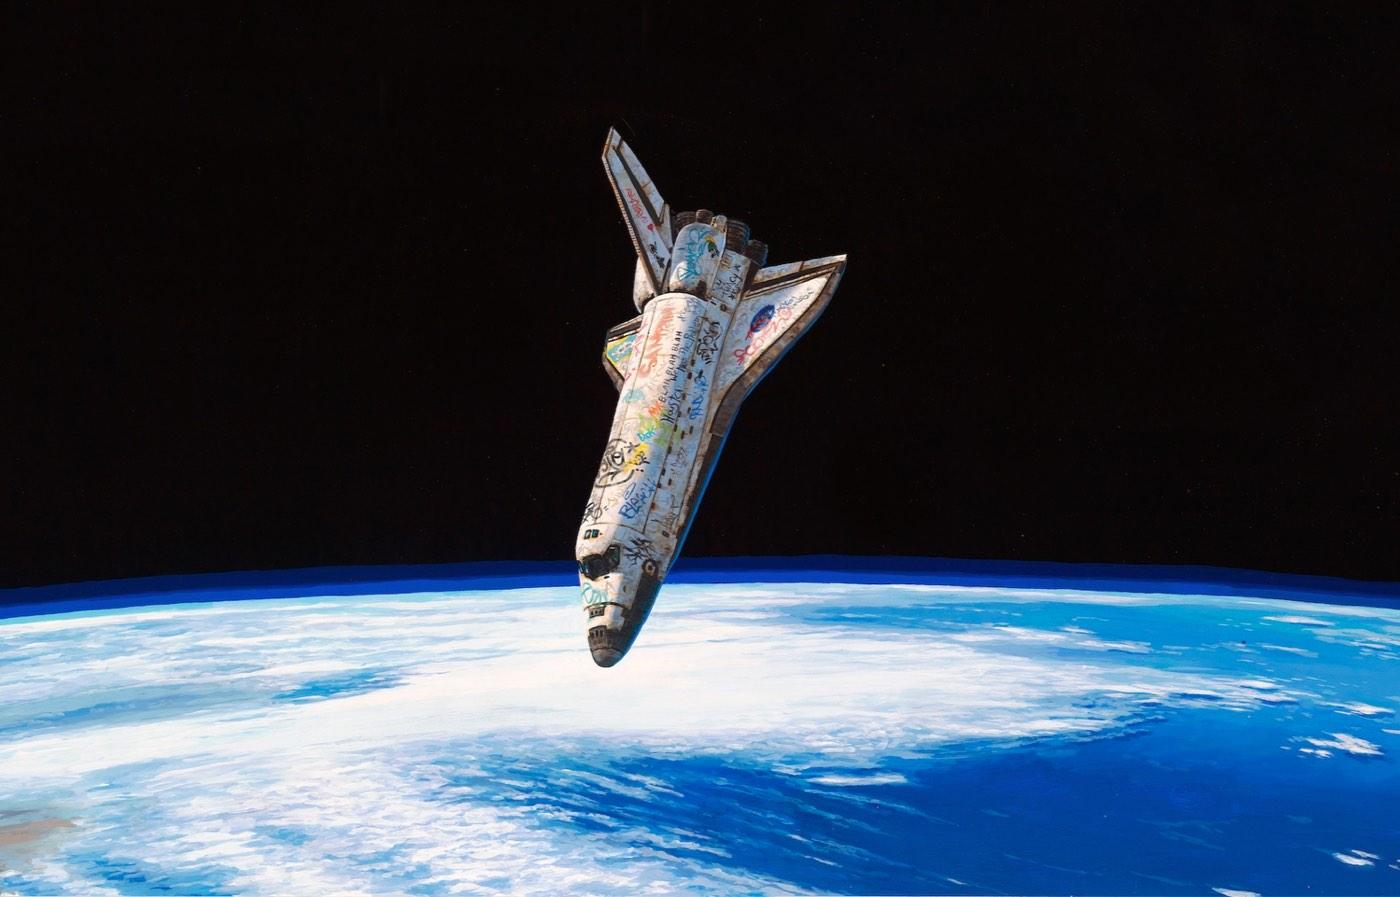 graffiti on space shuttle - photo #31